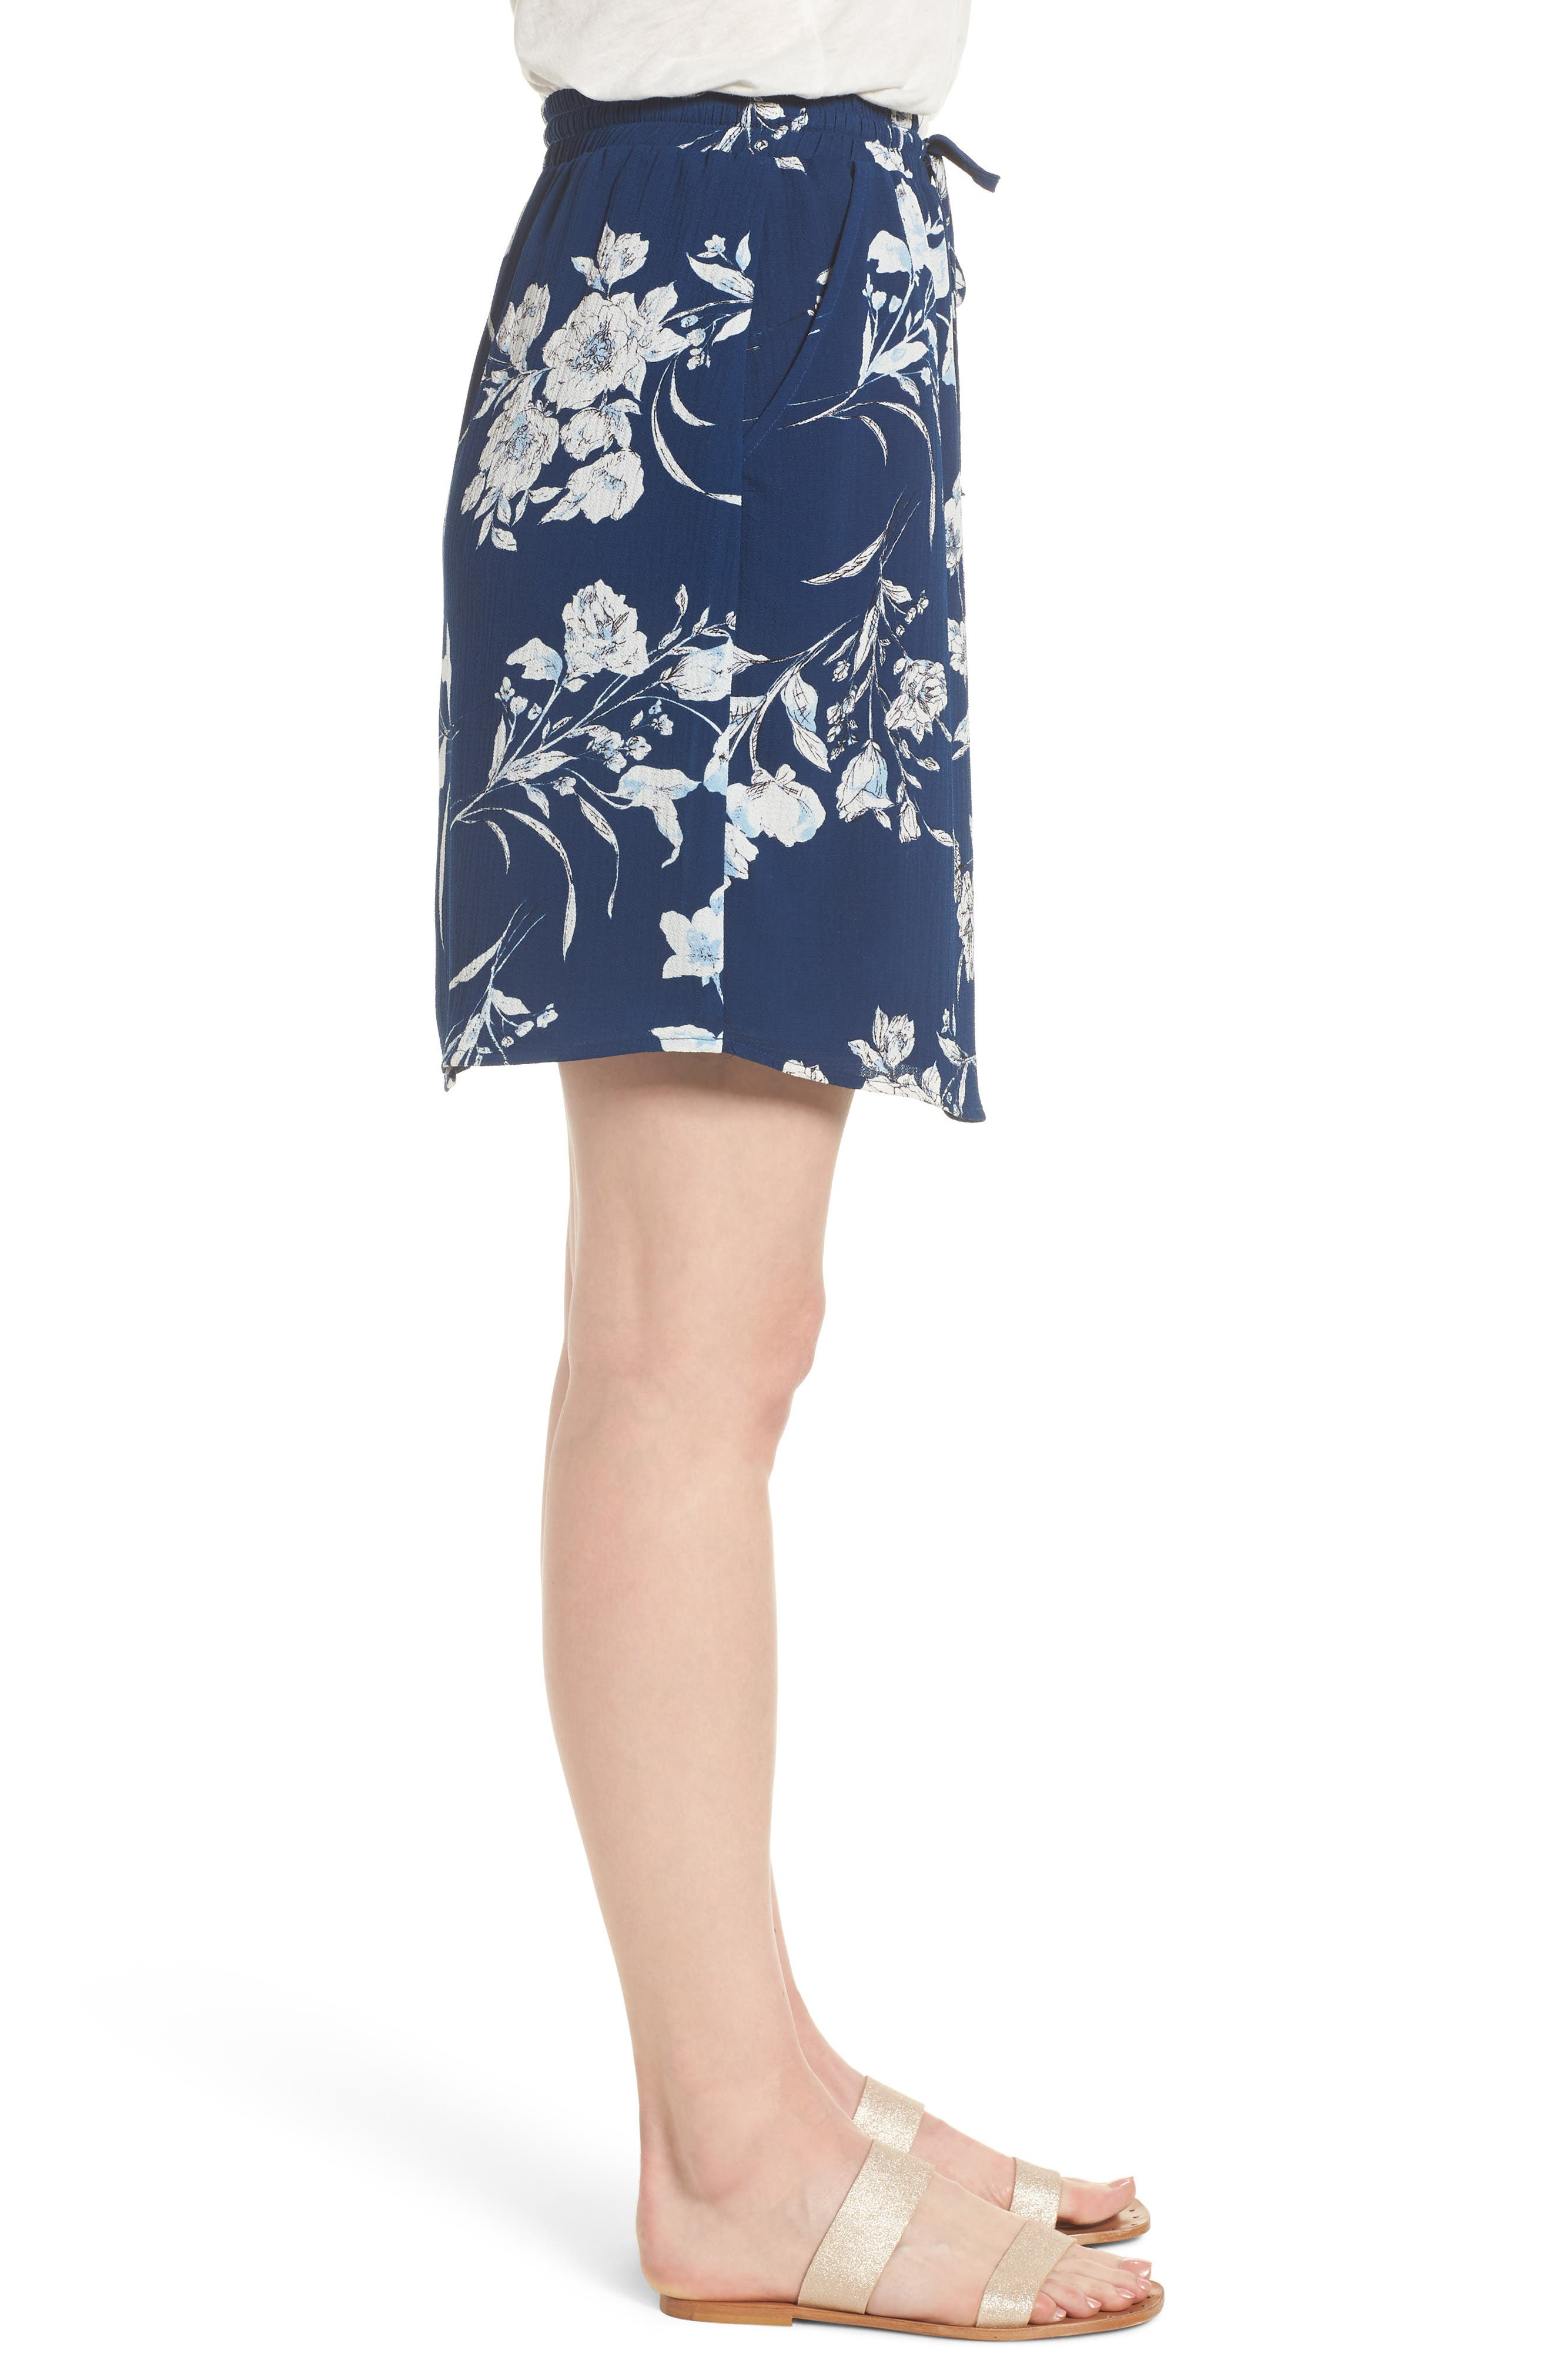 x Hi Sugarplum! Monterey Easy Skirt,                             Alternate thumbnail 4, color,                             Cool Breeze Floral